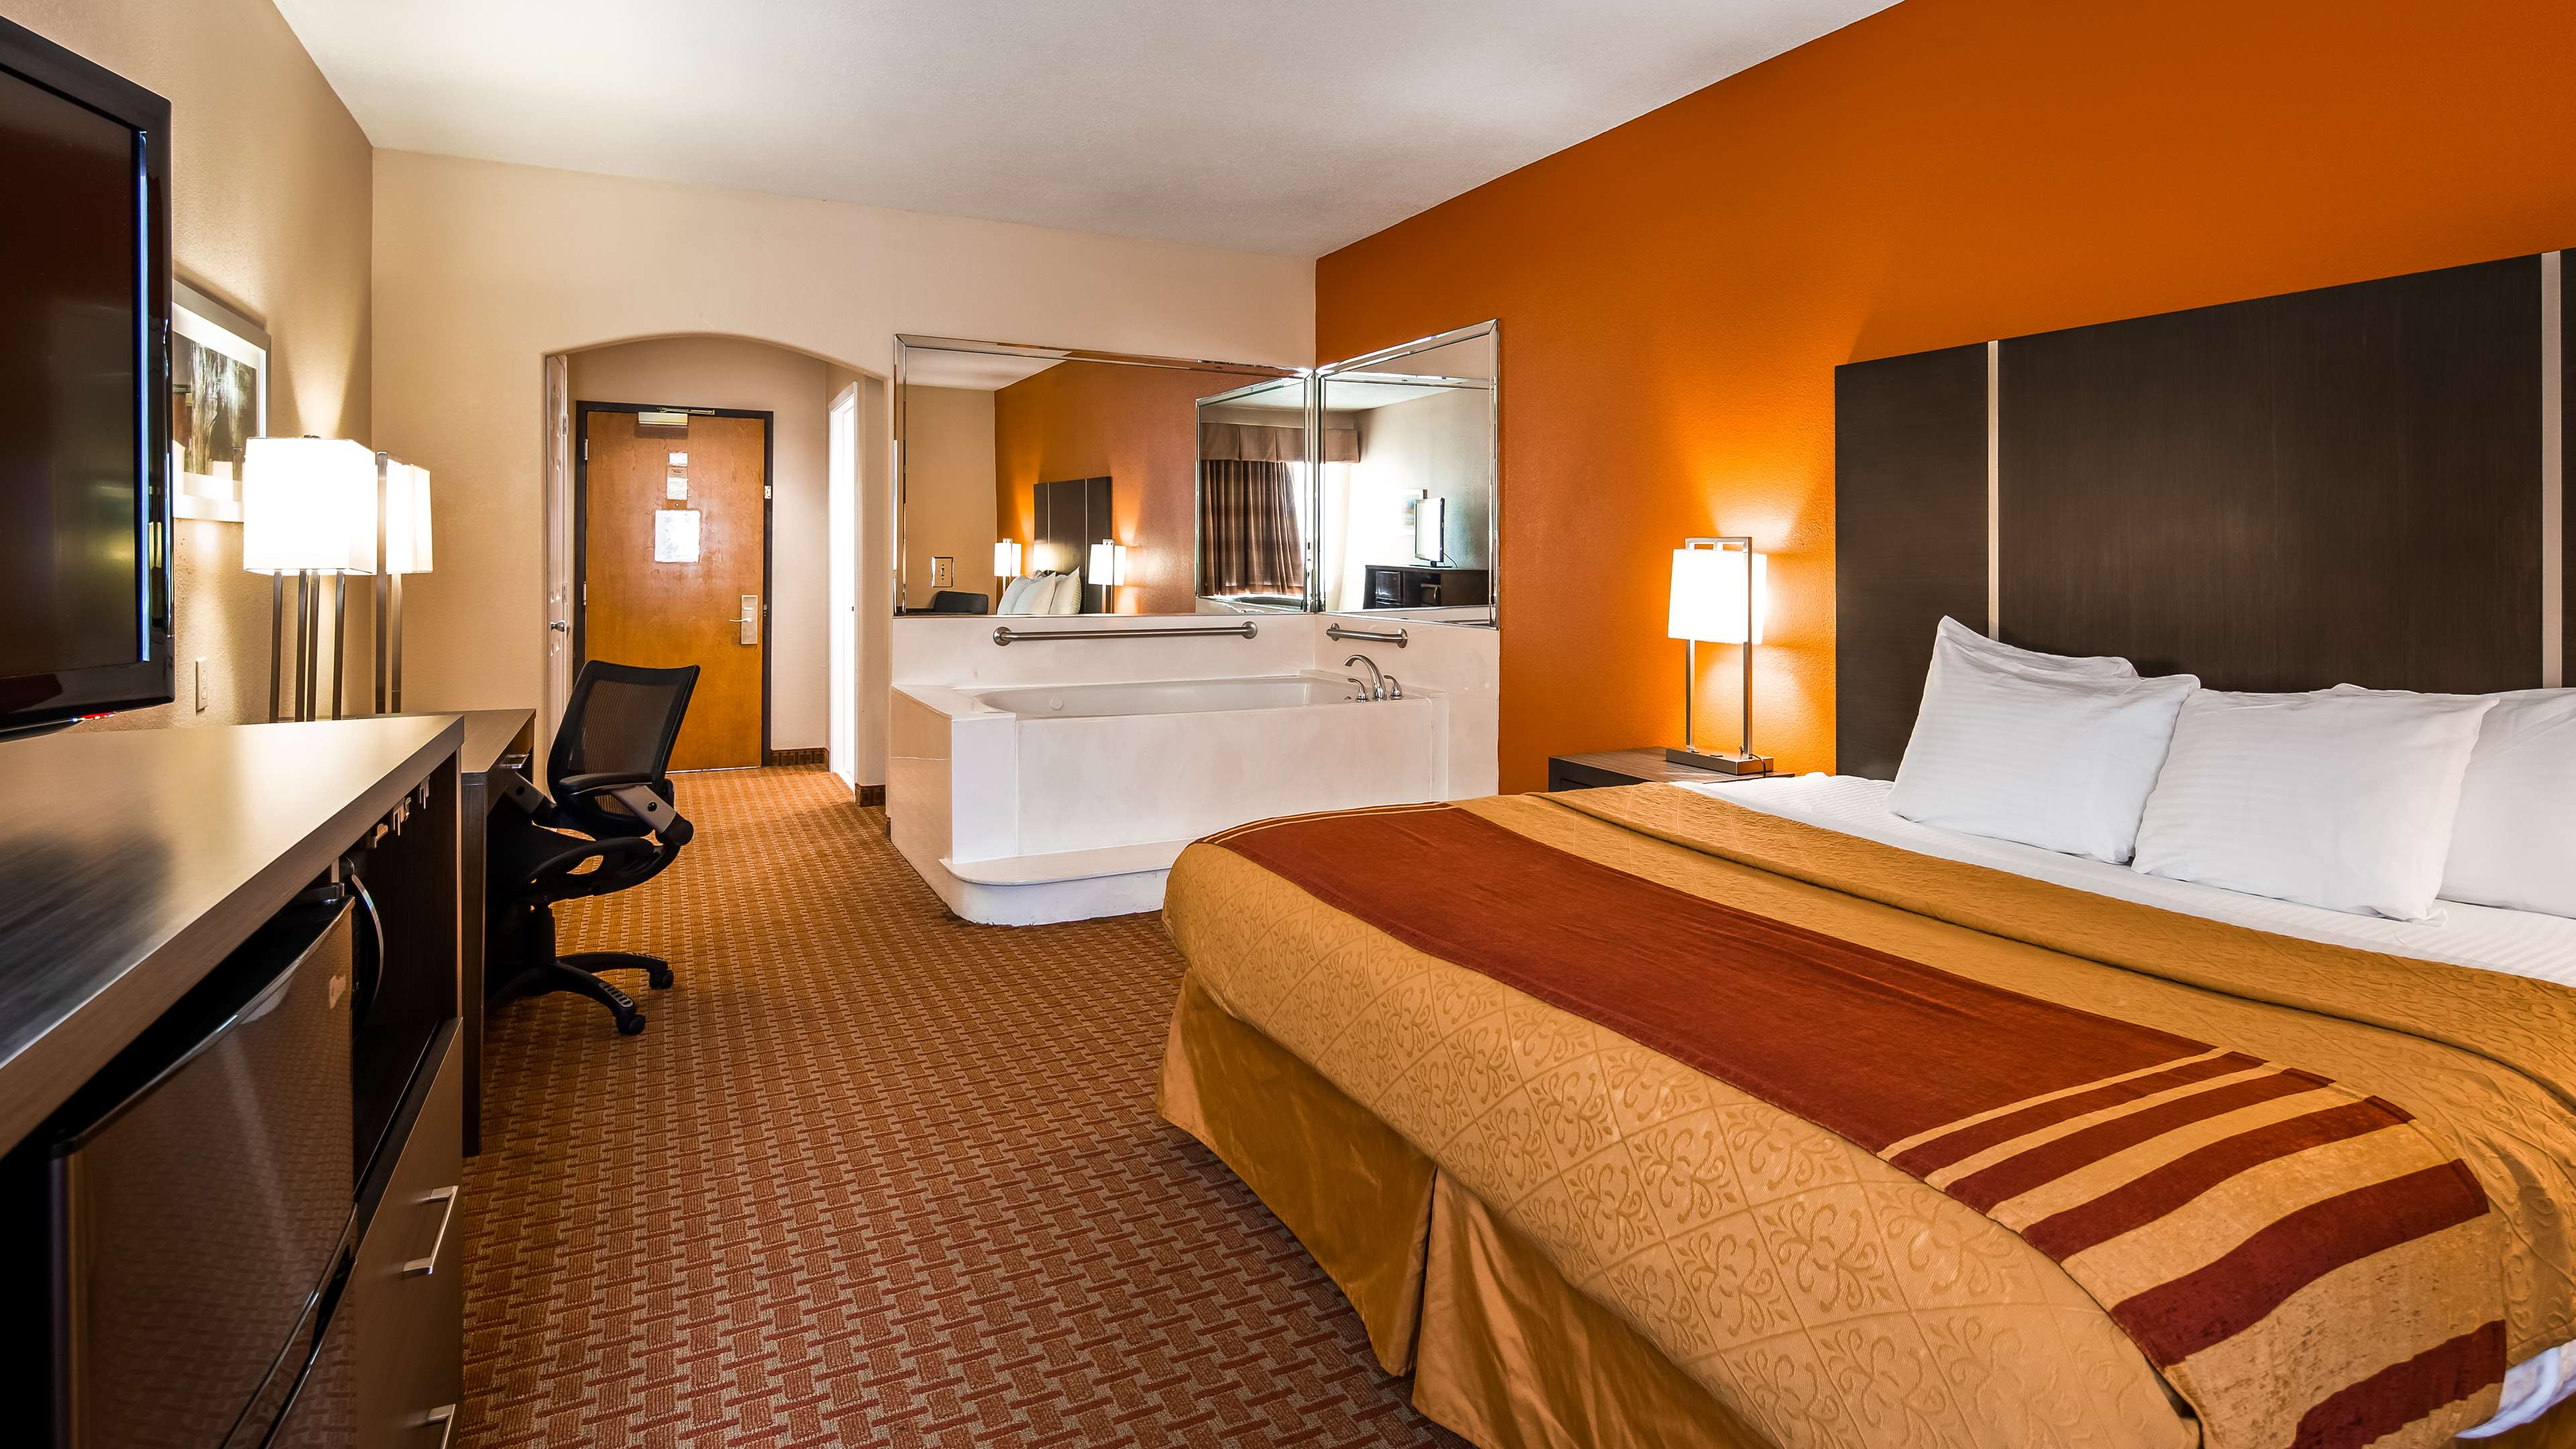 Best Western Plus North Houston Inn & Suites image 11